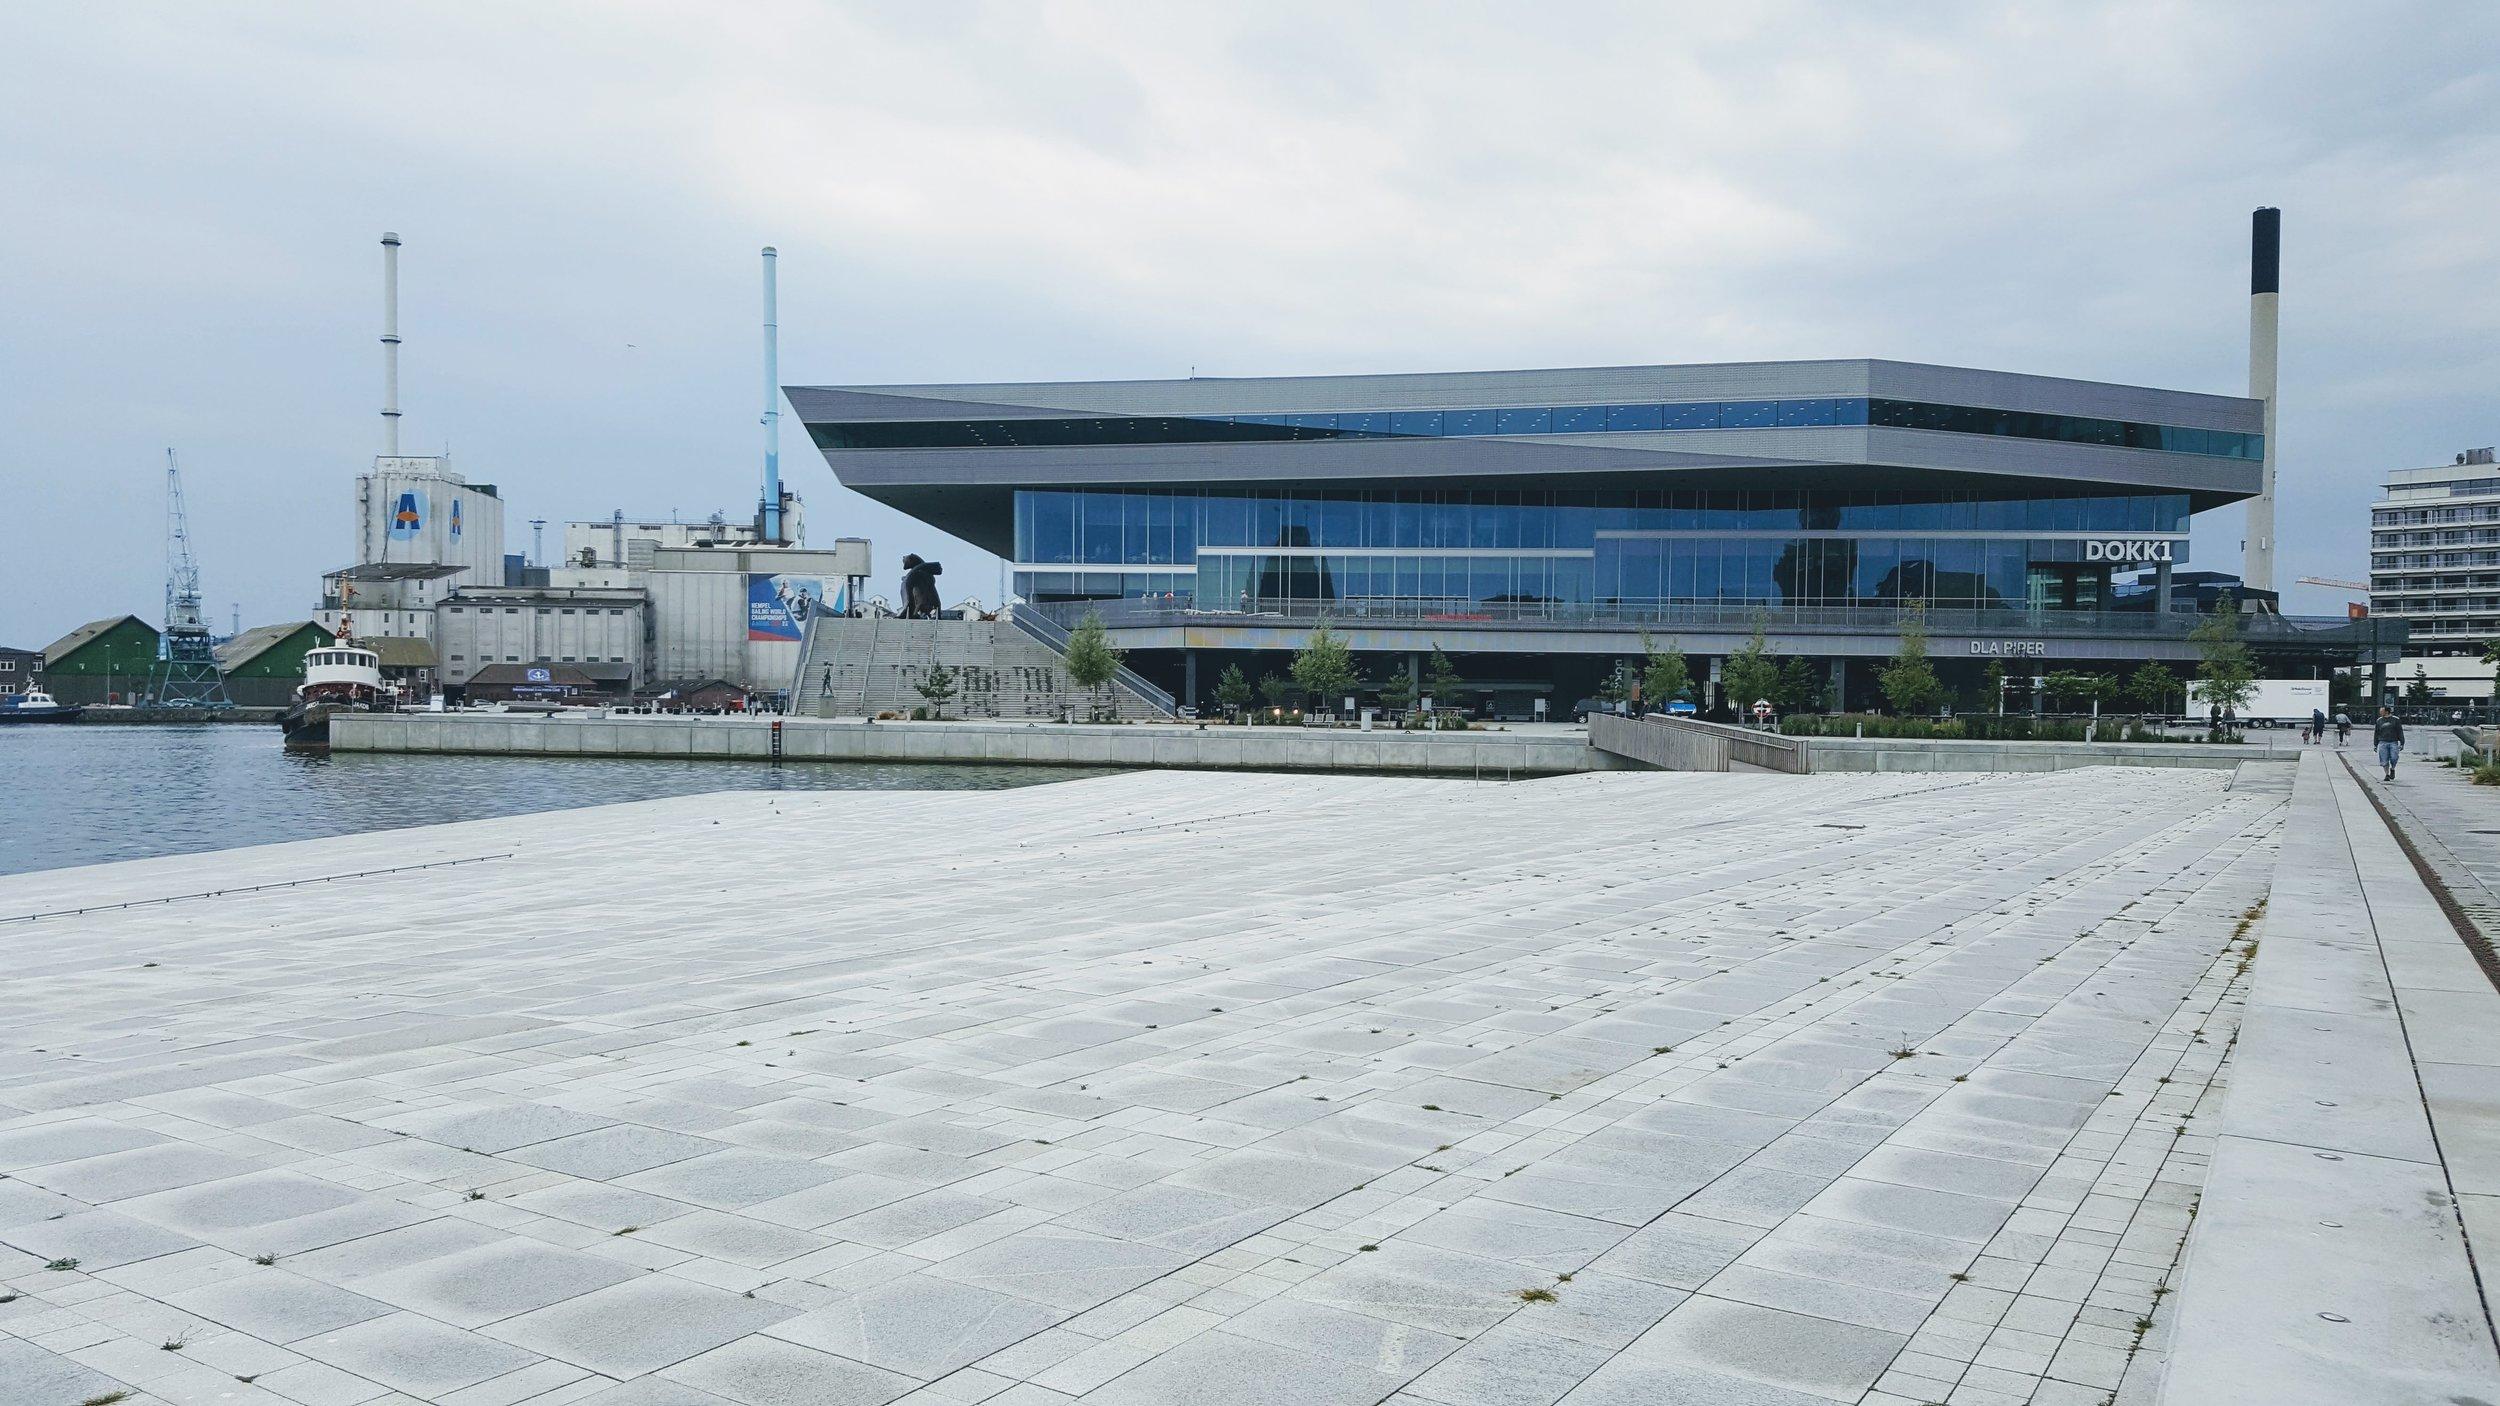 Architecture in Aarhus